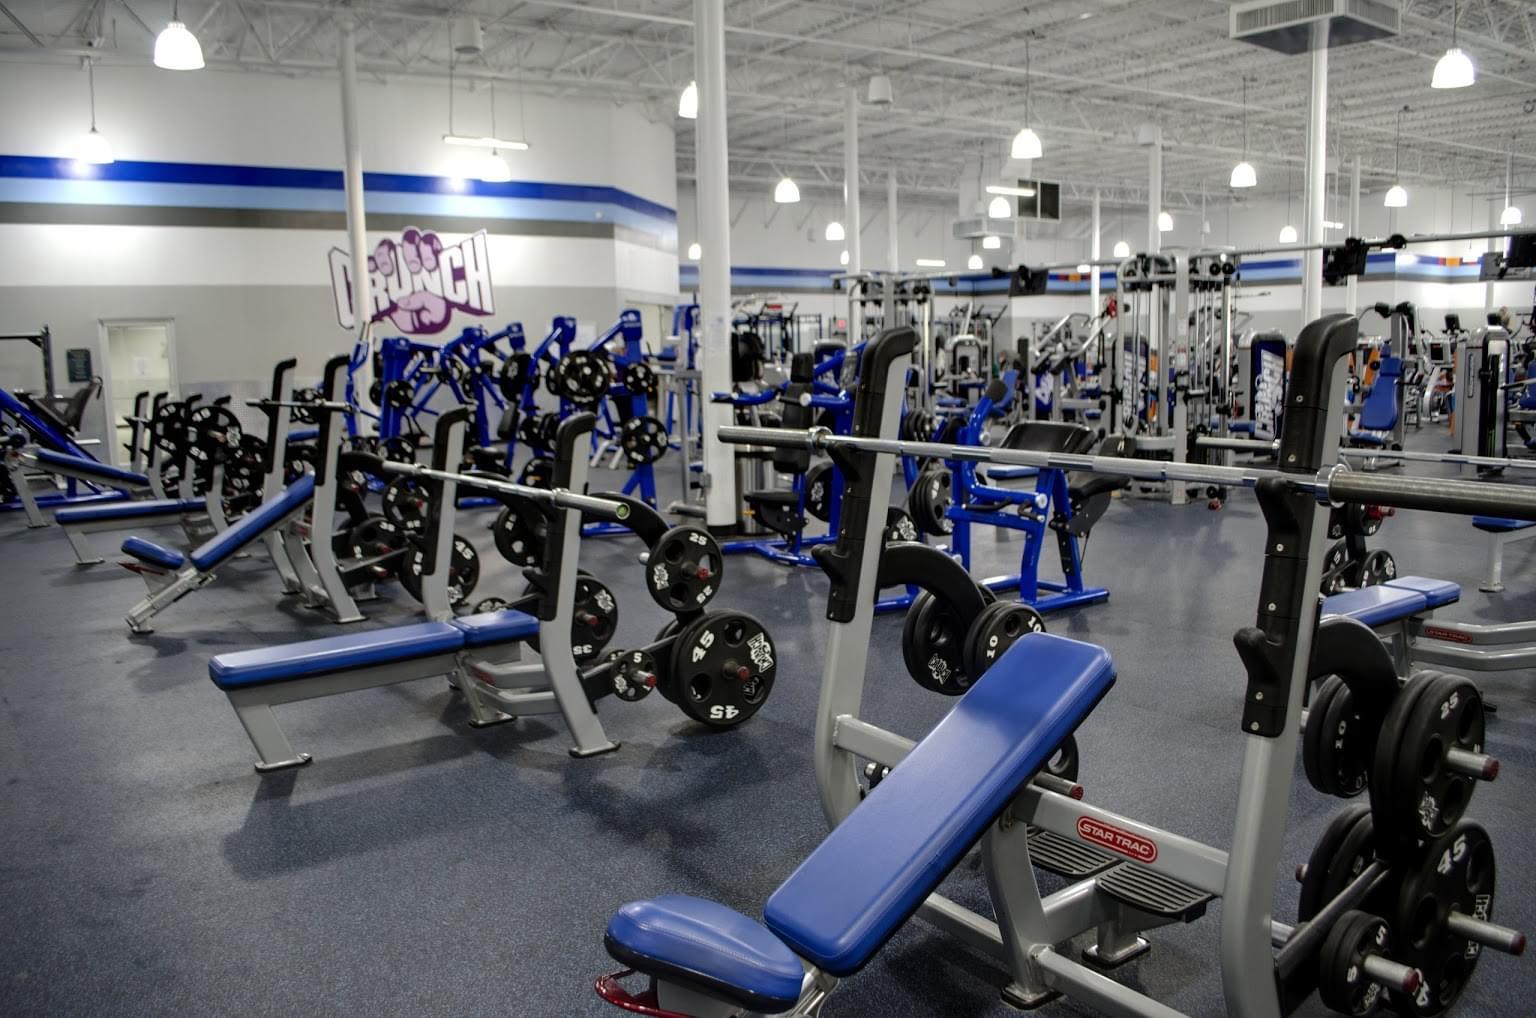 Crunch-Fitness-Gym-in-North-Charleston-SC-bench-press-shoulder-press.jpg